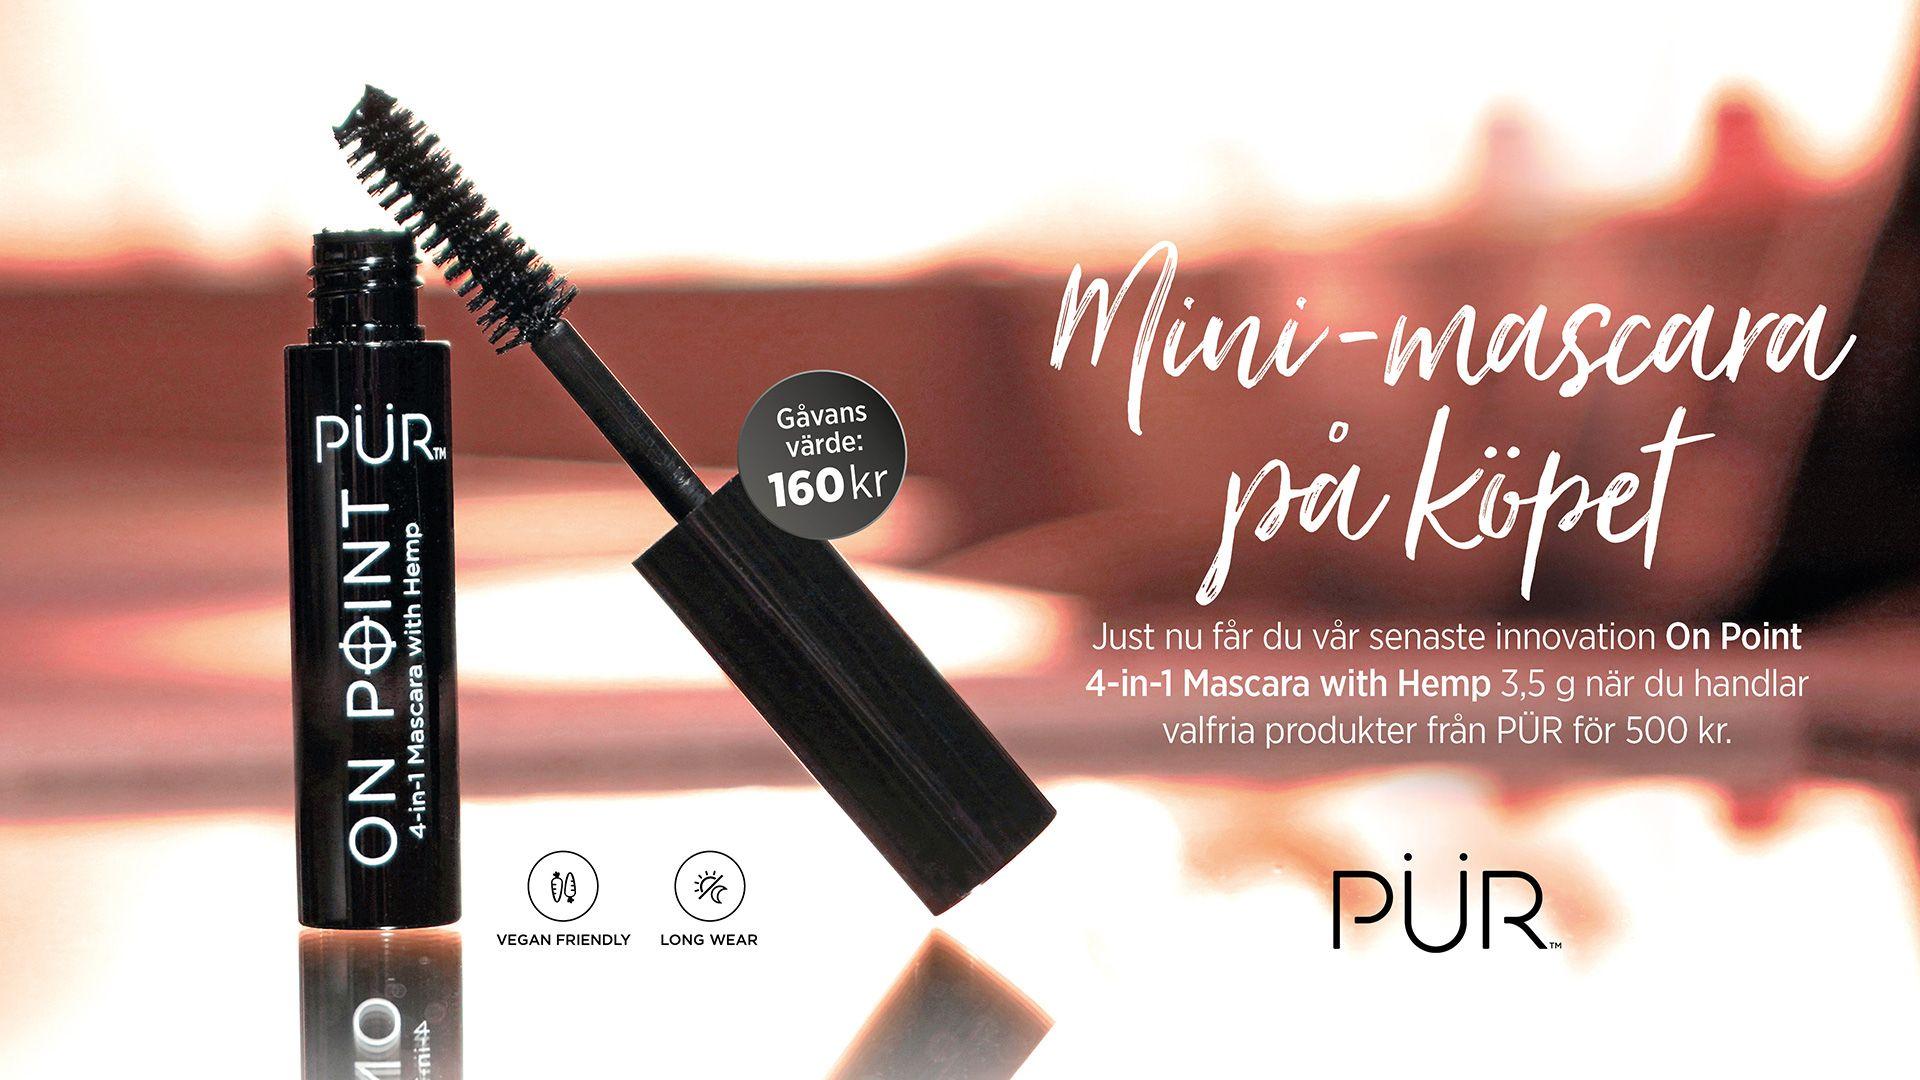 pur_mascara